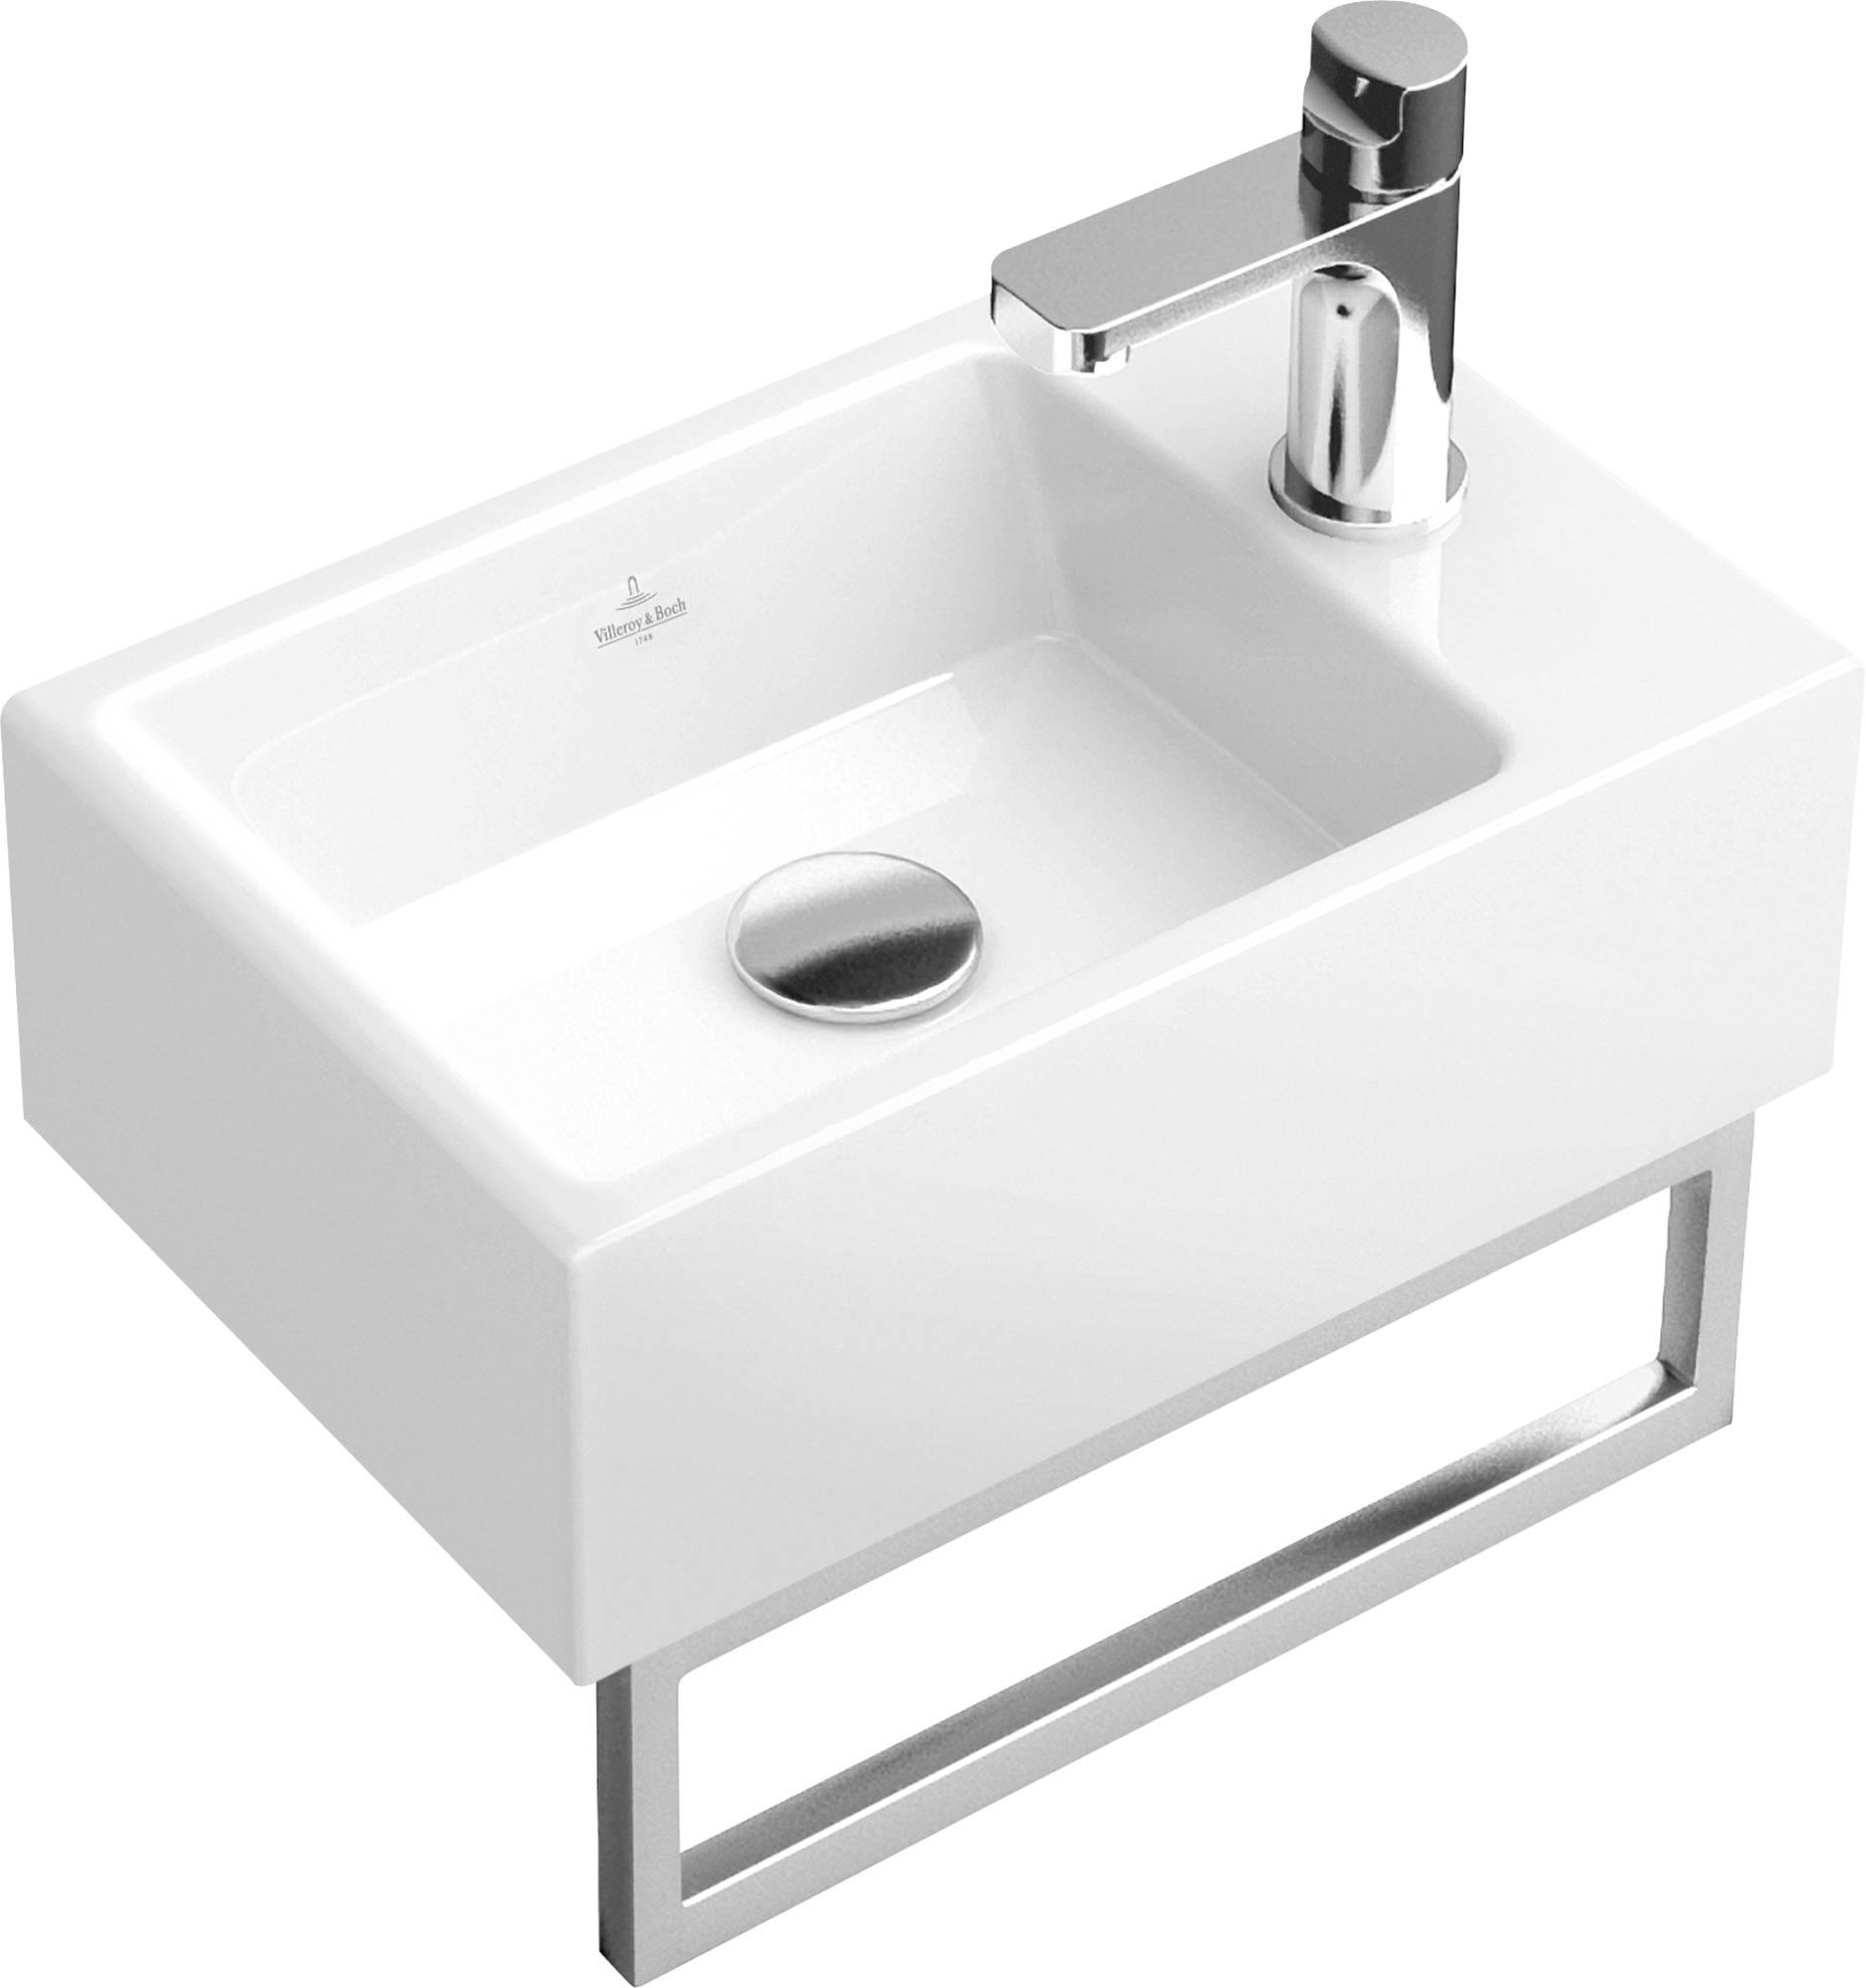 Villeroy & Boch Memento Handdoekhouder voor wastafel 34,5cm Glans RVS